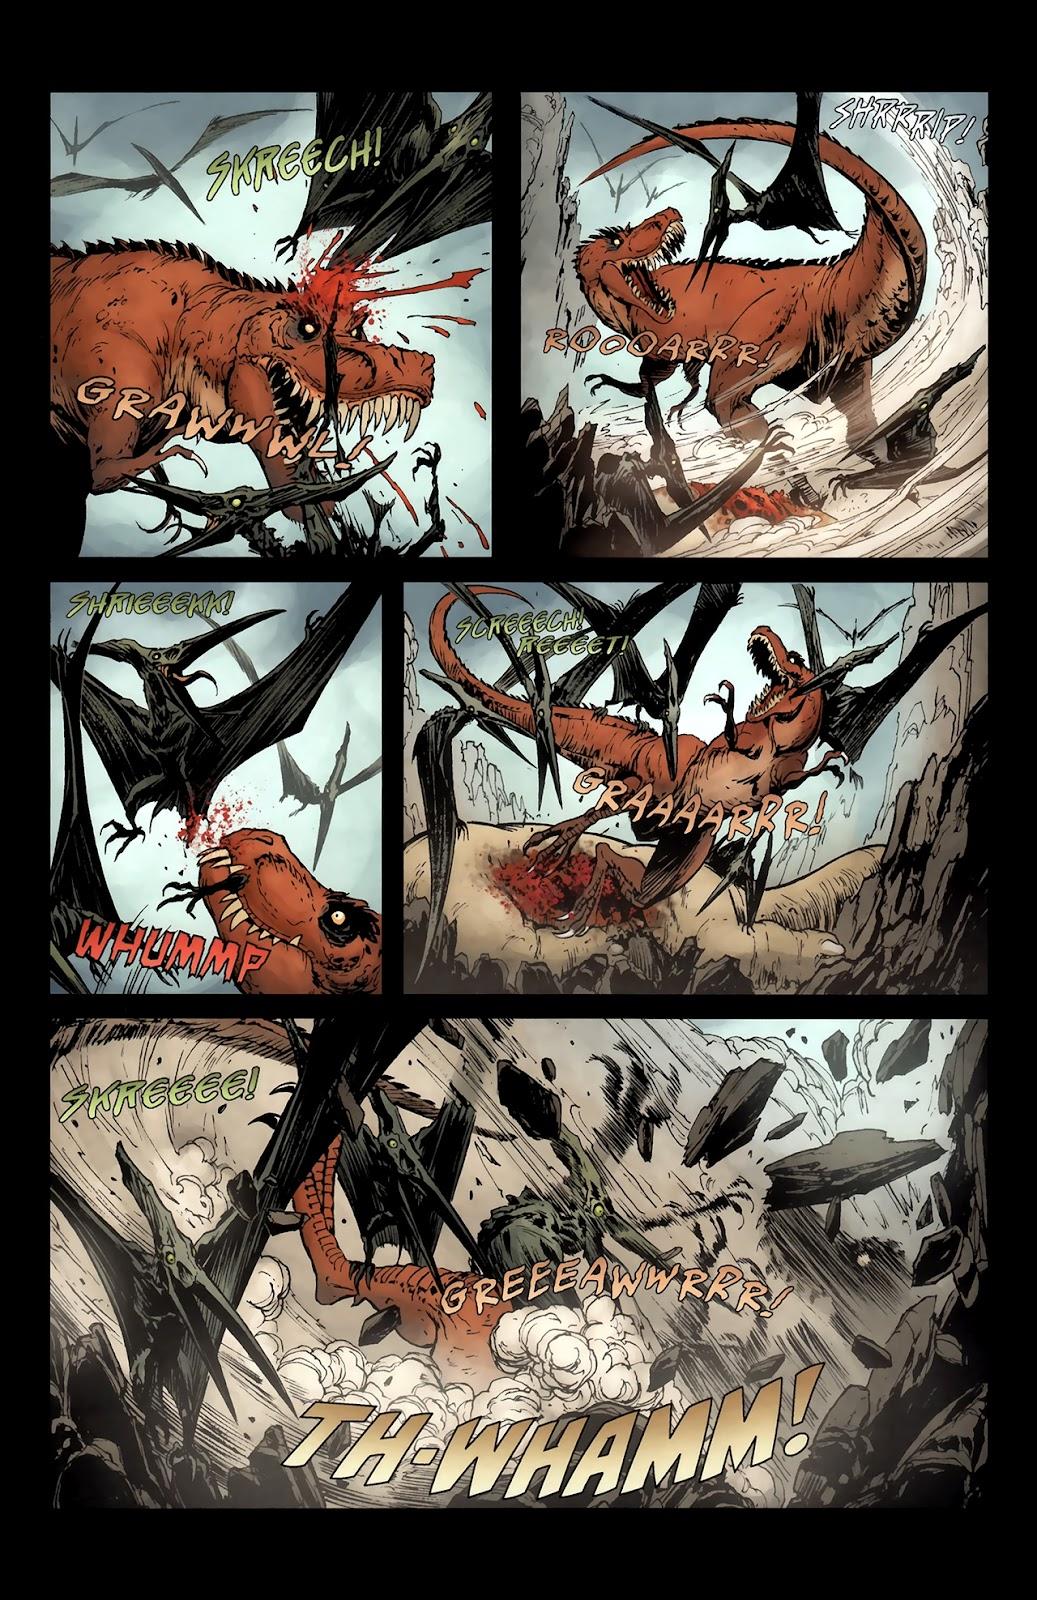 Read online Tyrannosaurus Rex comic -  Issue # Full - 11